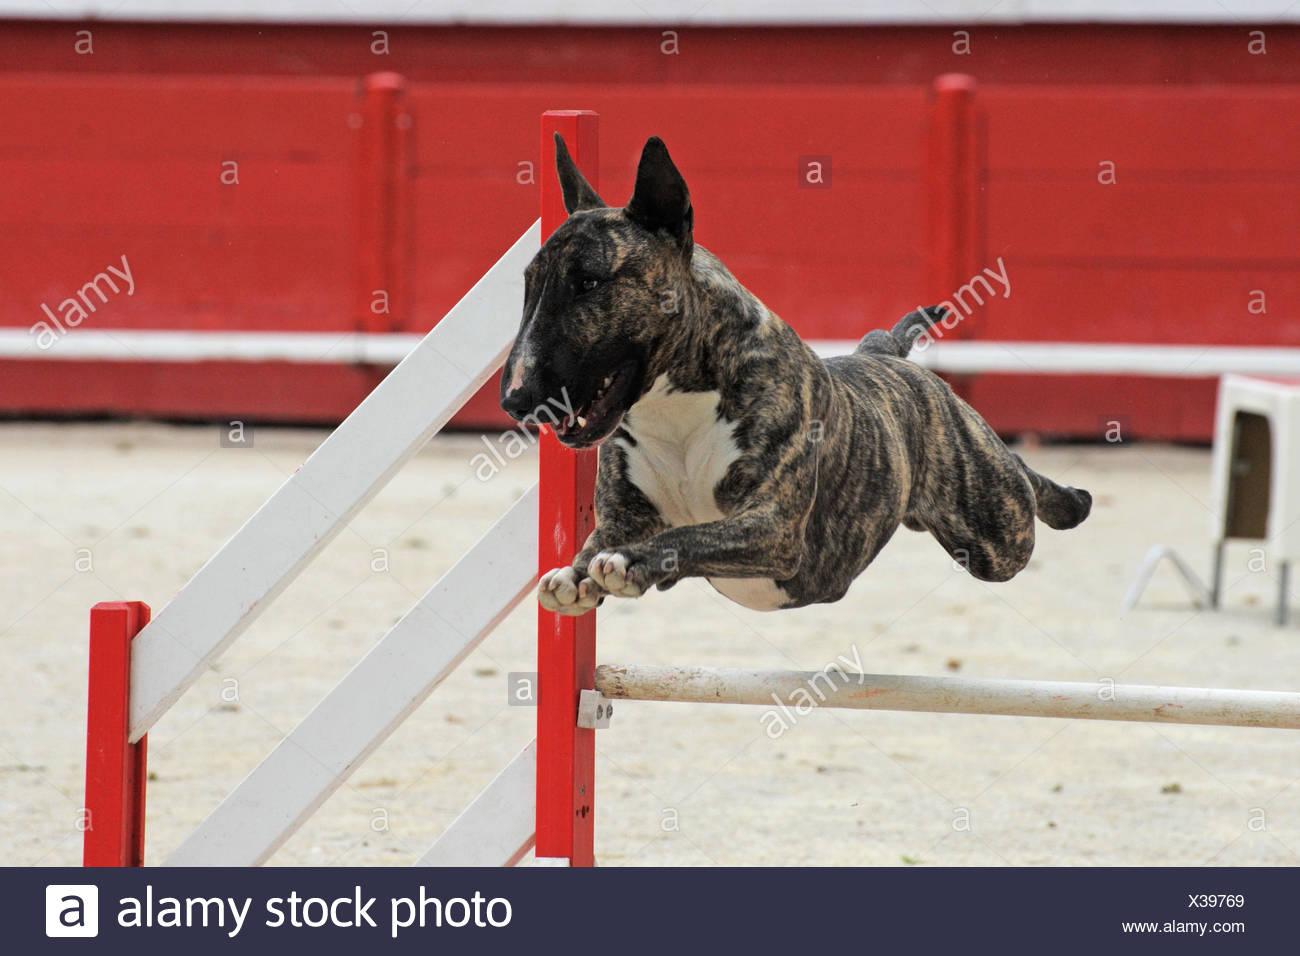 dog spring bouncing bounces hop skipping frisks jumping jump agility sport sports run running runs motion postponement moving - Stock Image